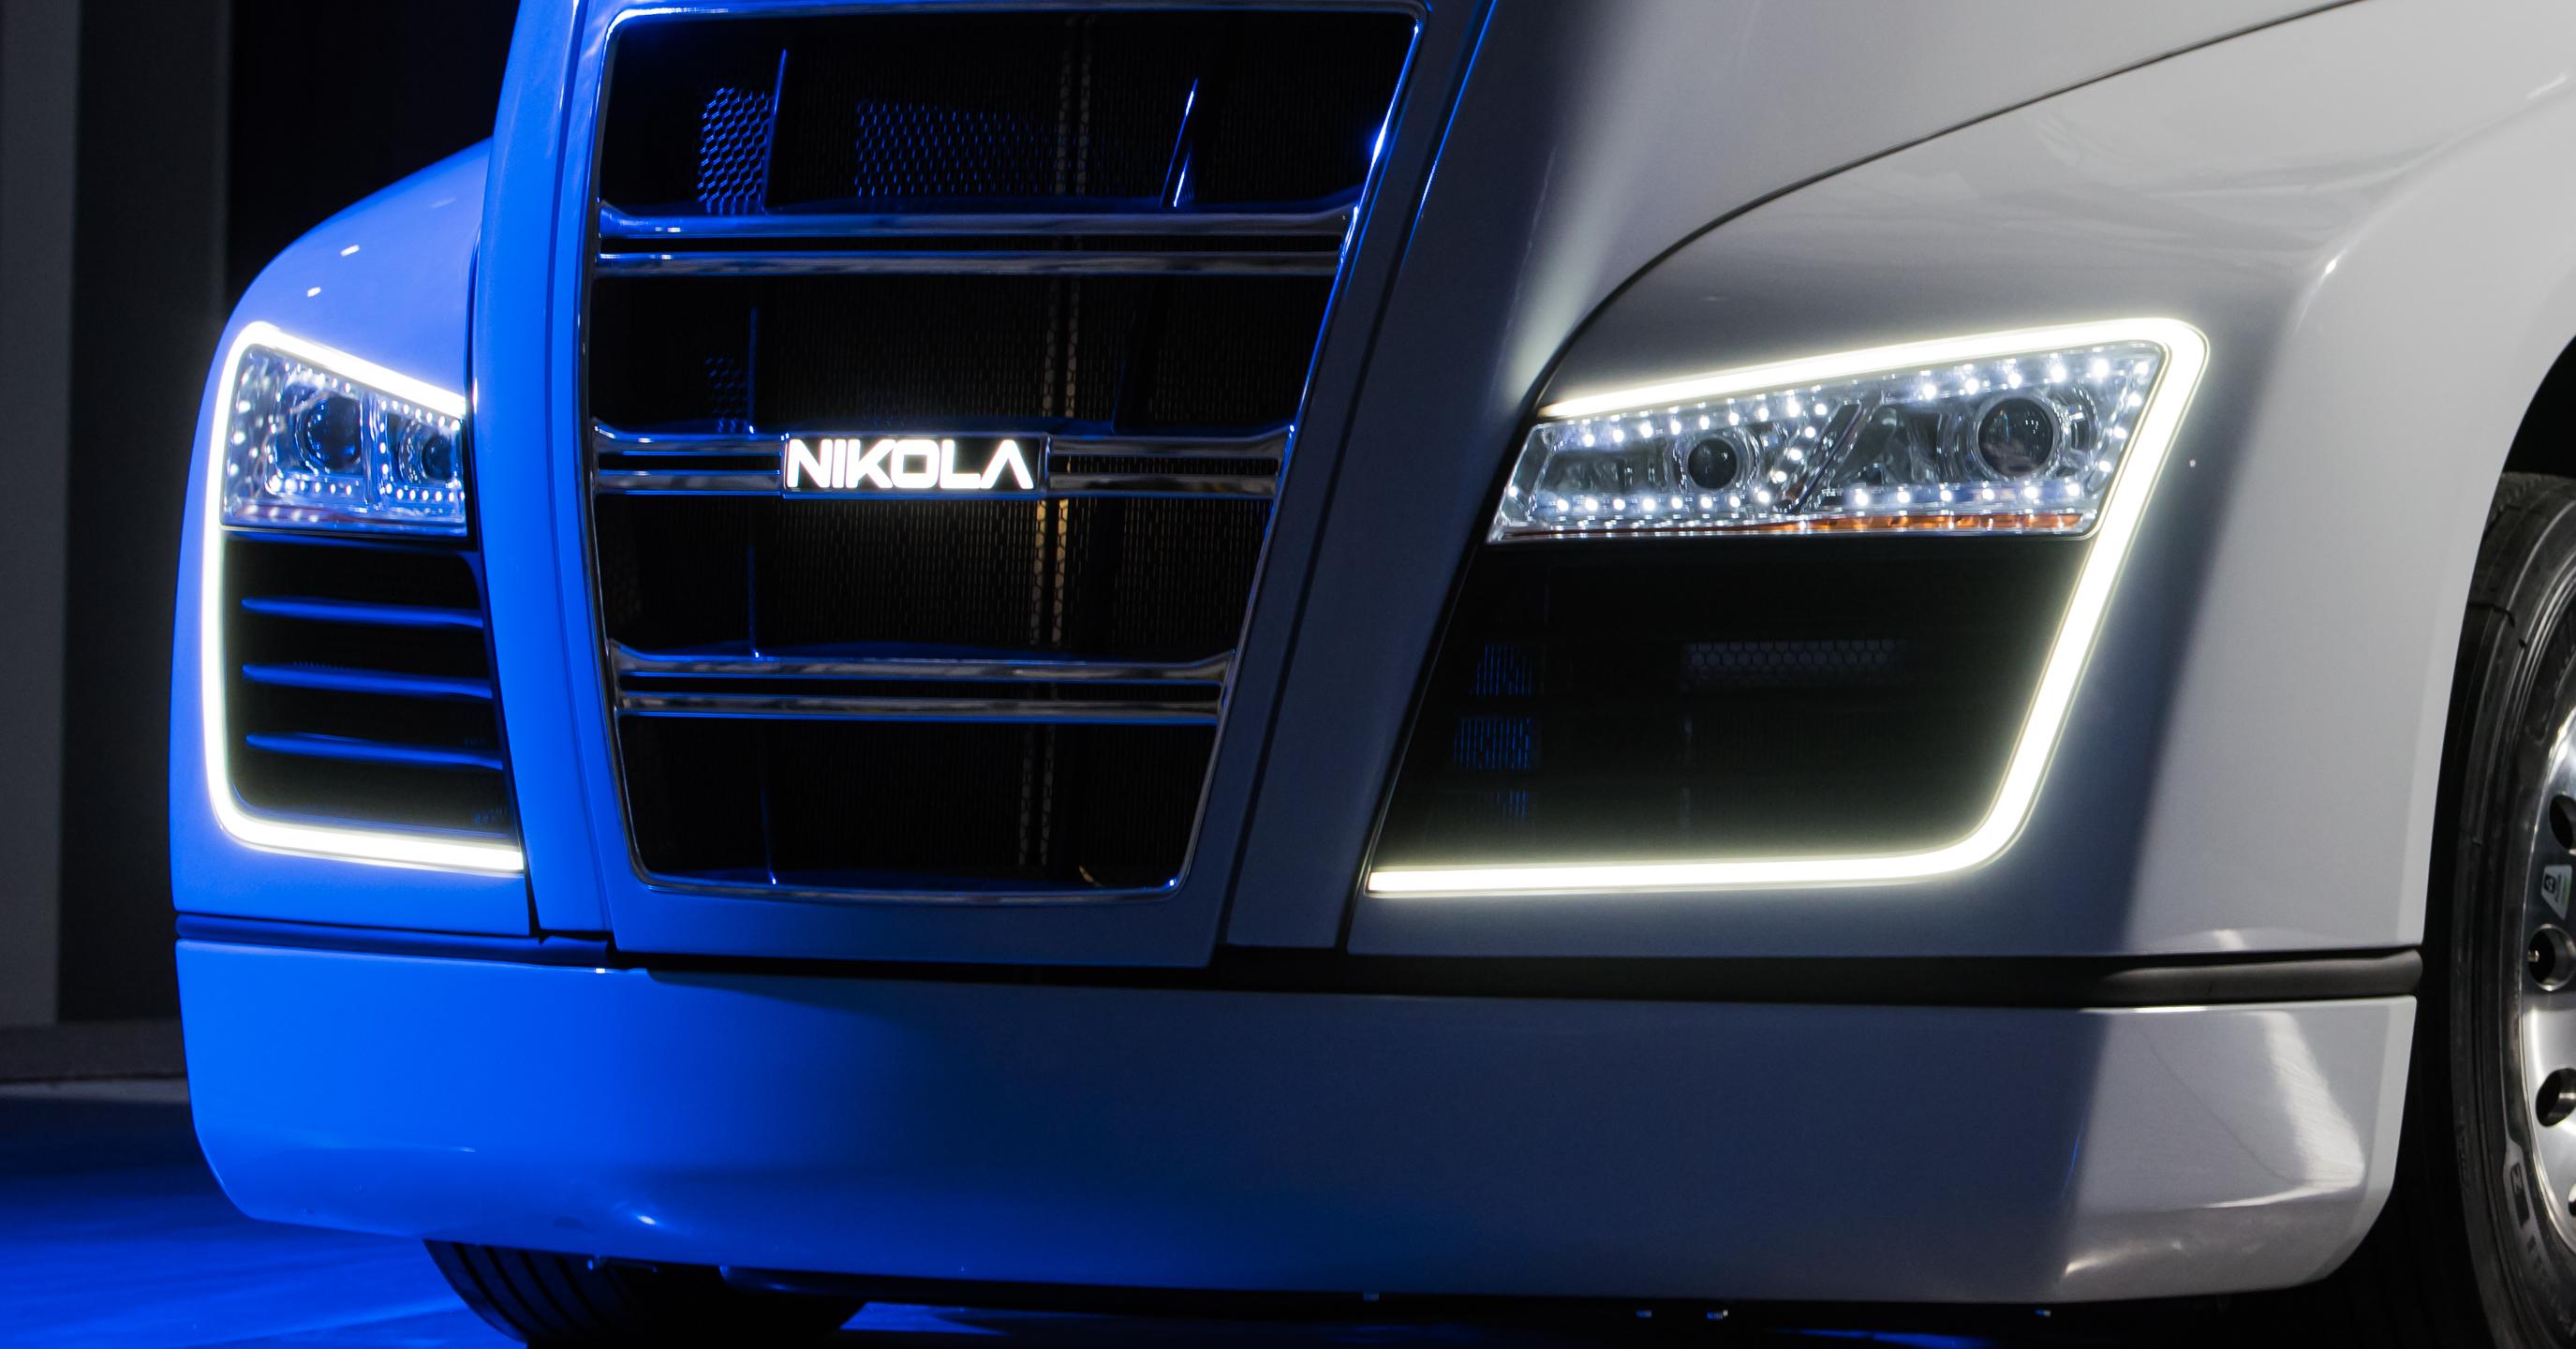 Hydrogen-powered semi-trucks saving businesses money: Nikola CEO